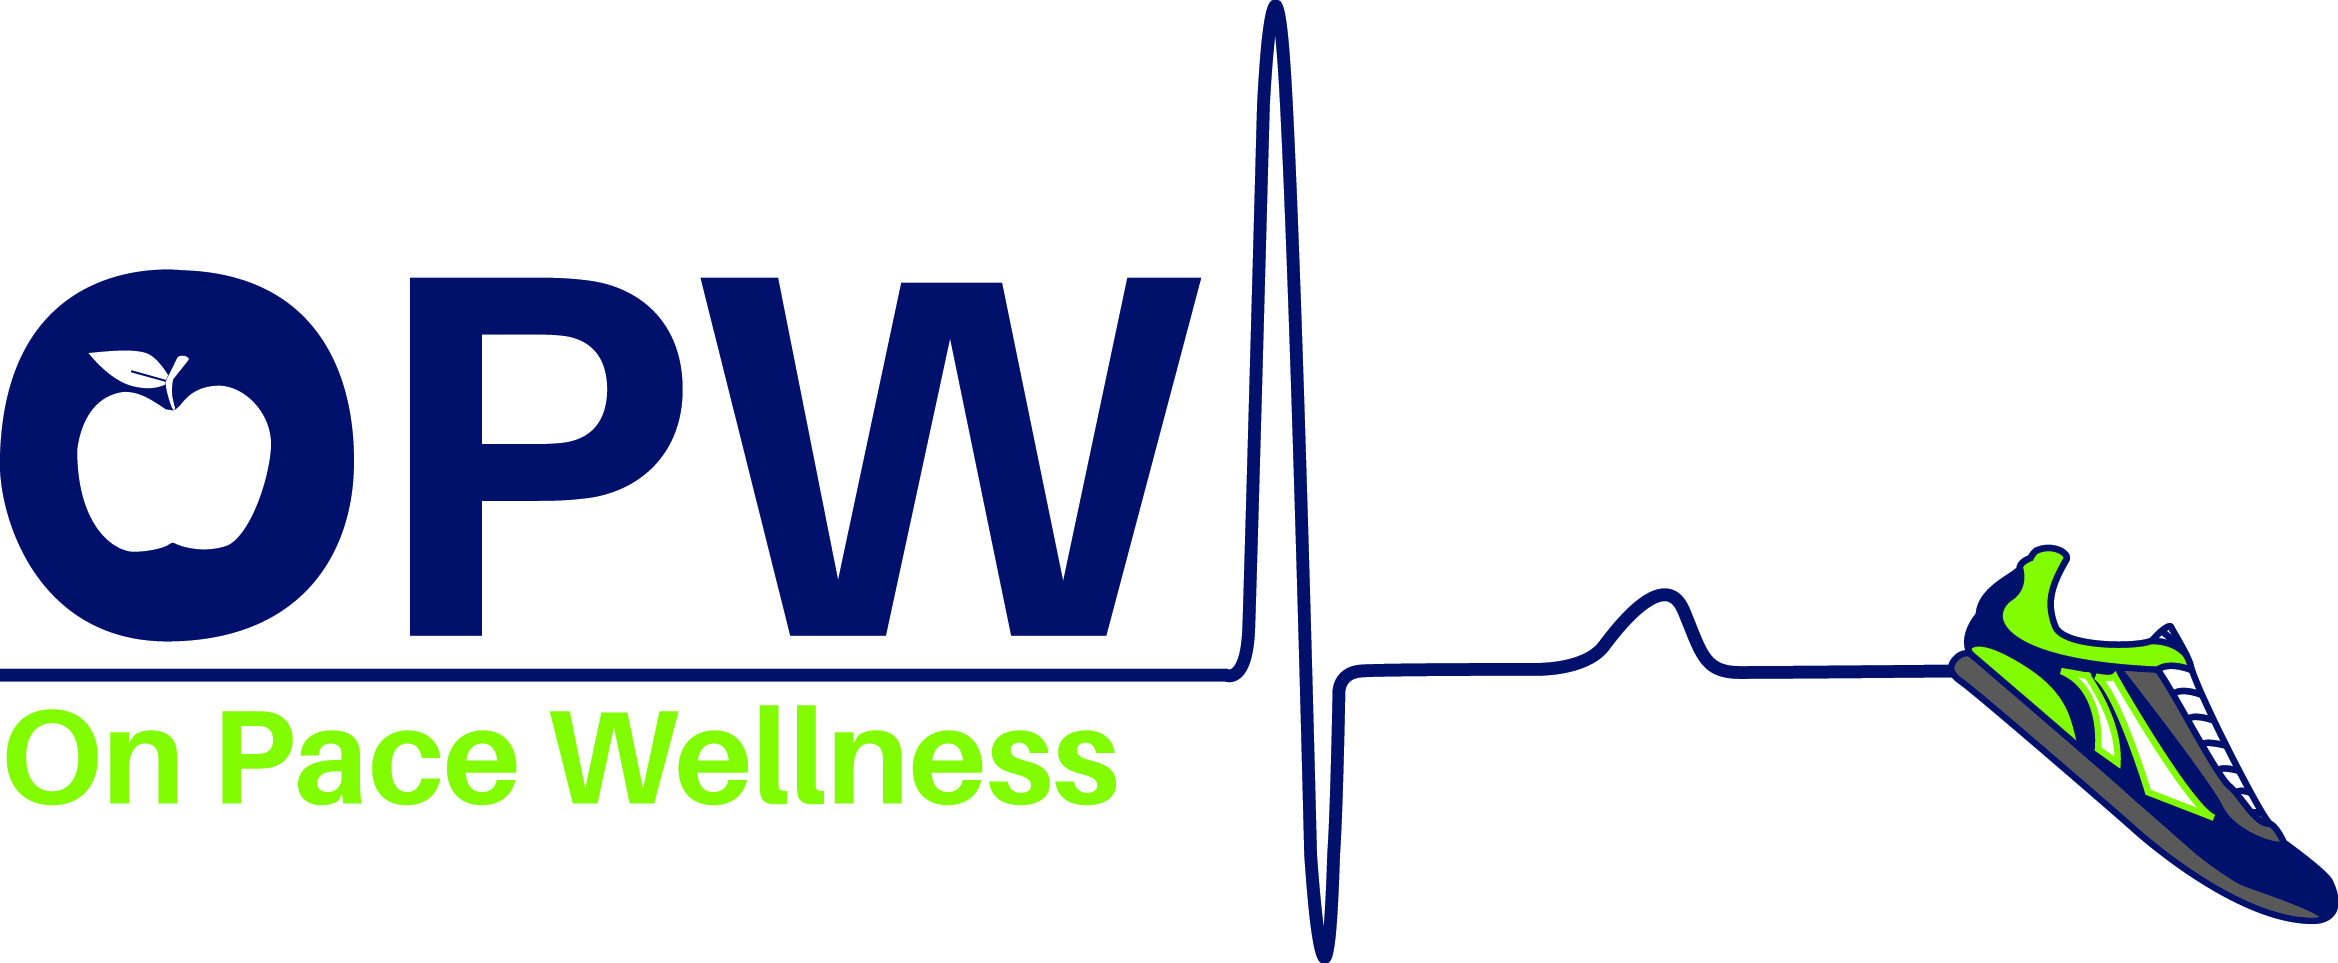 OPW logo_CMYK.jpg